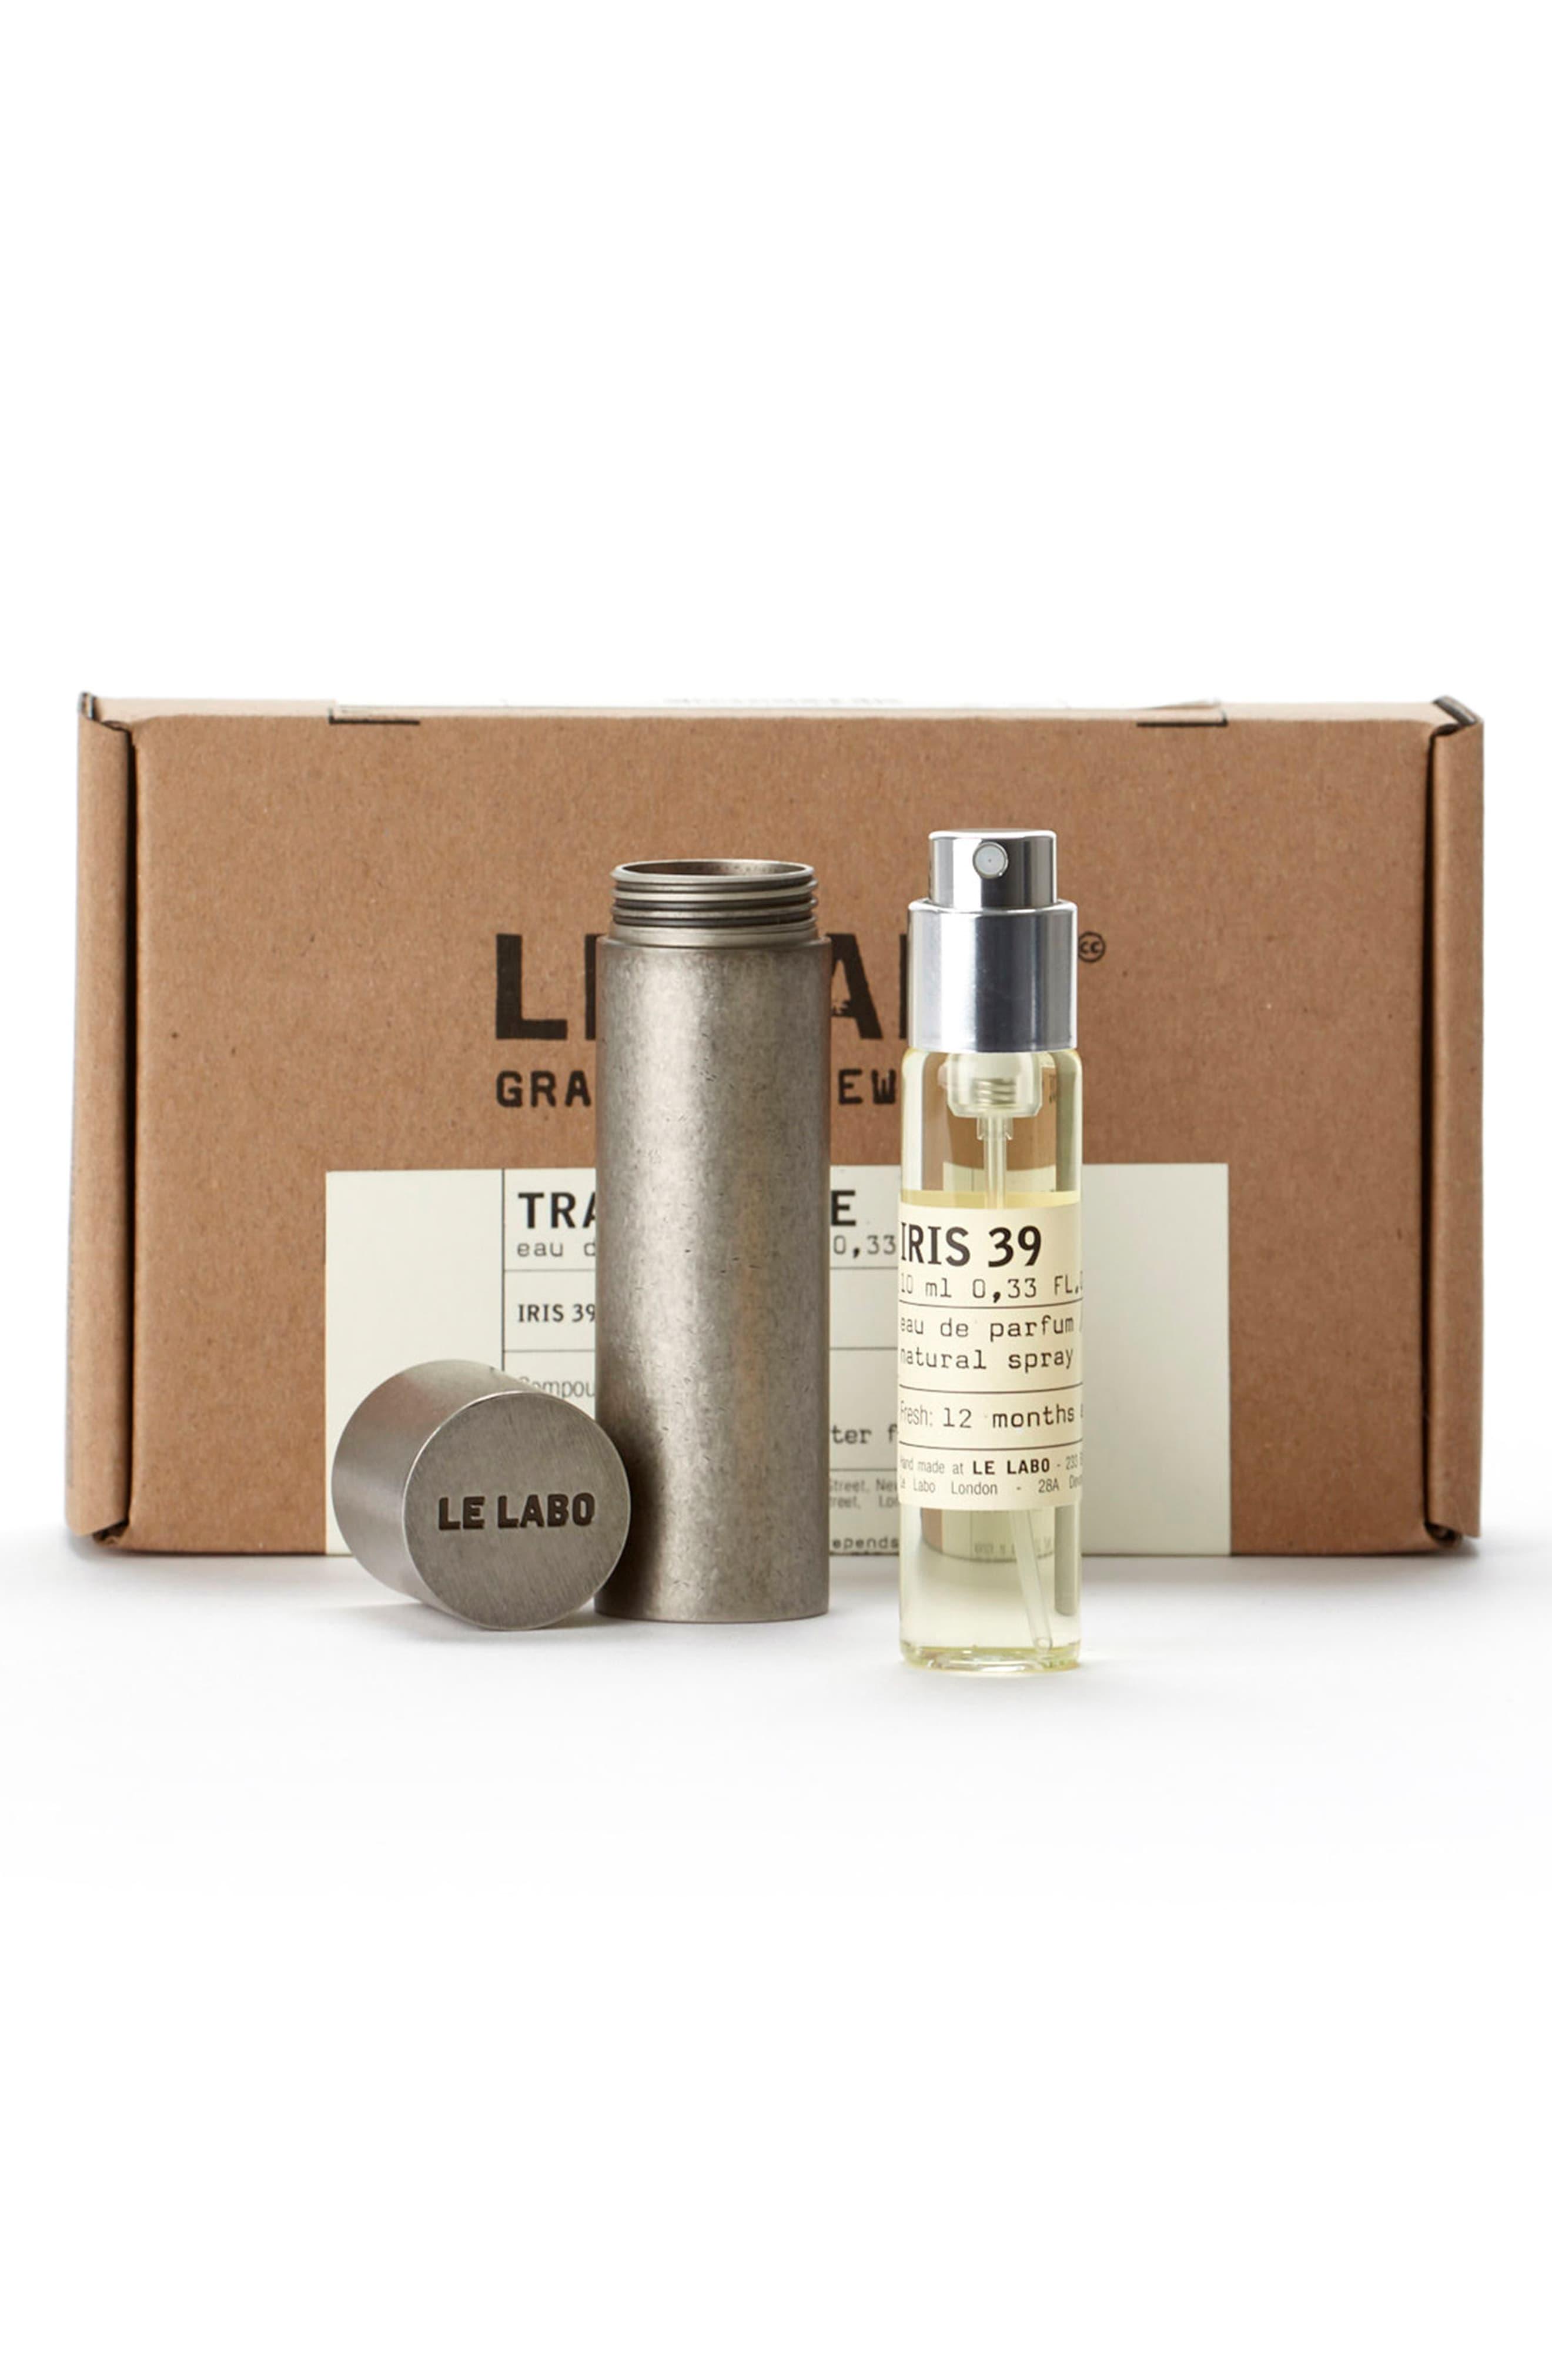 Le Labo 'Iris 39' Travel Tube Perfume, Iris, Lip conditioner